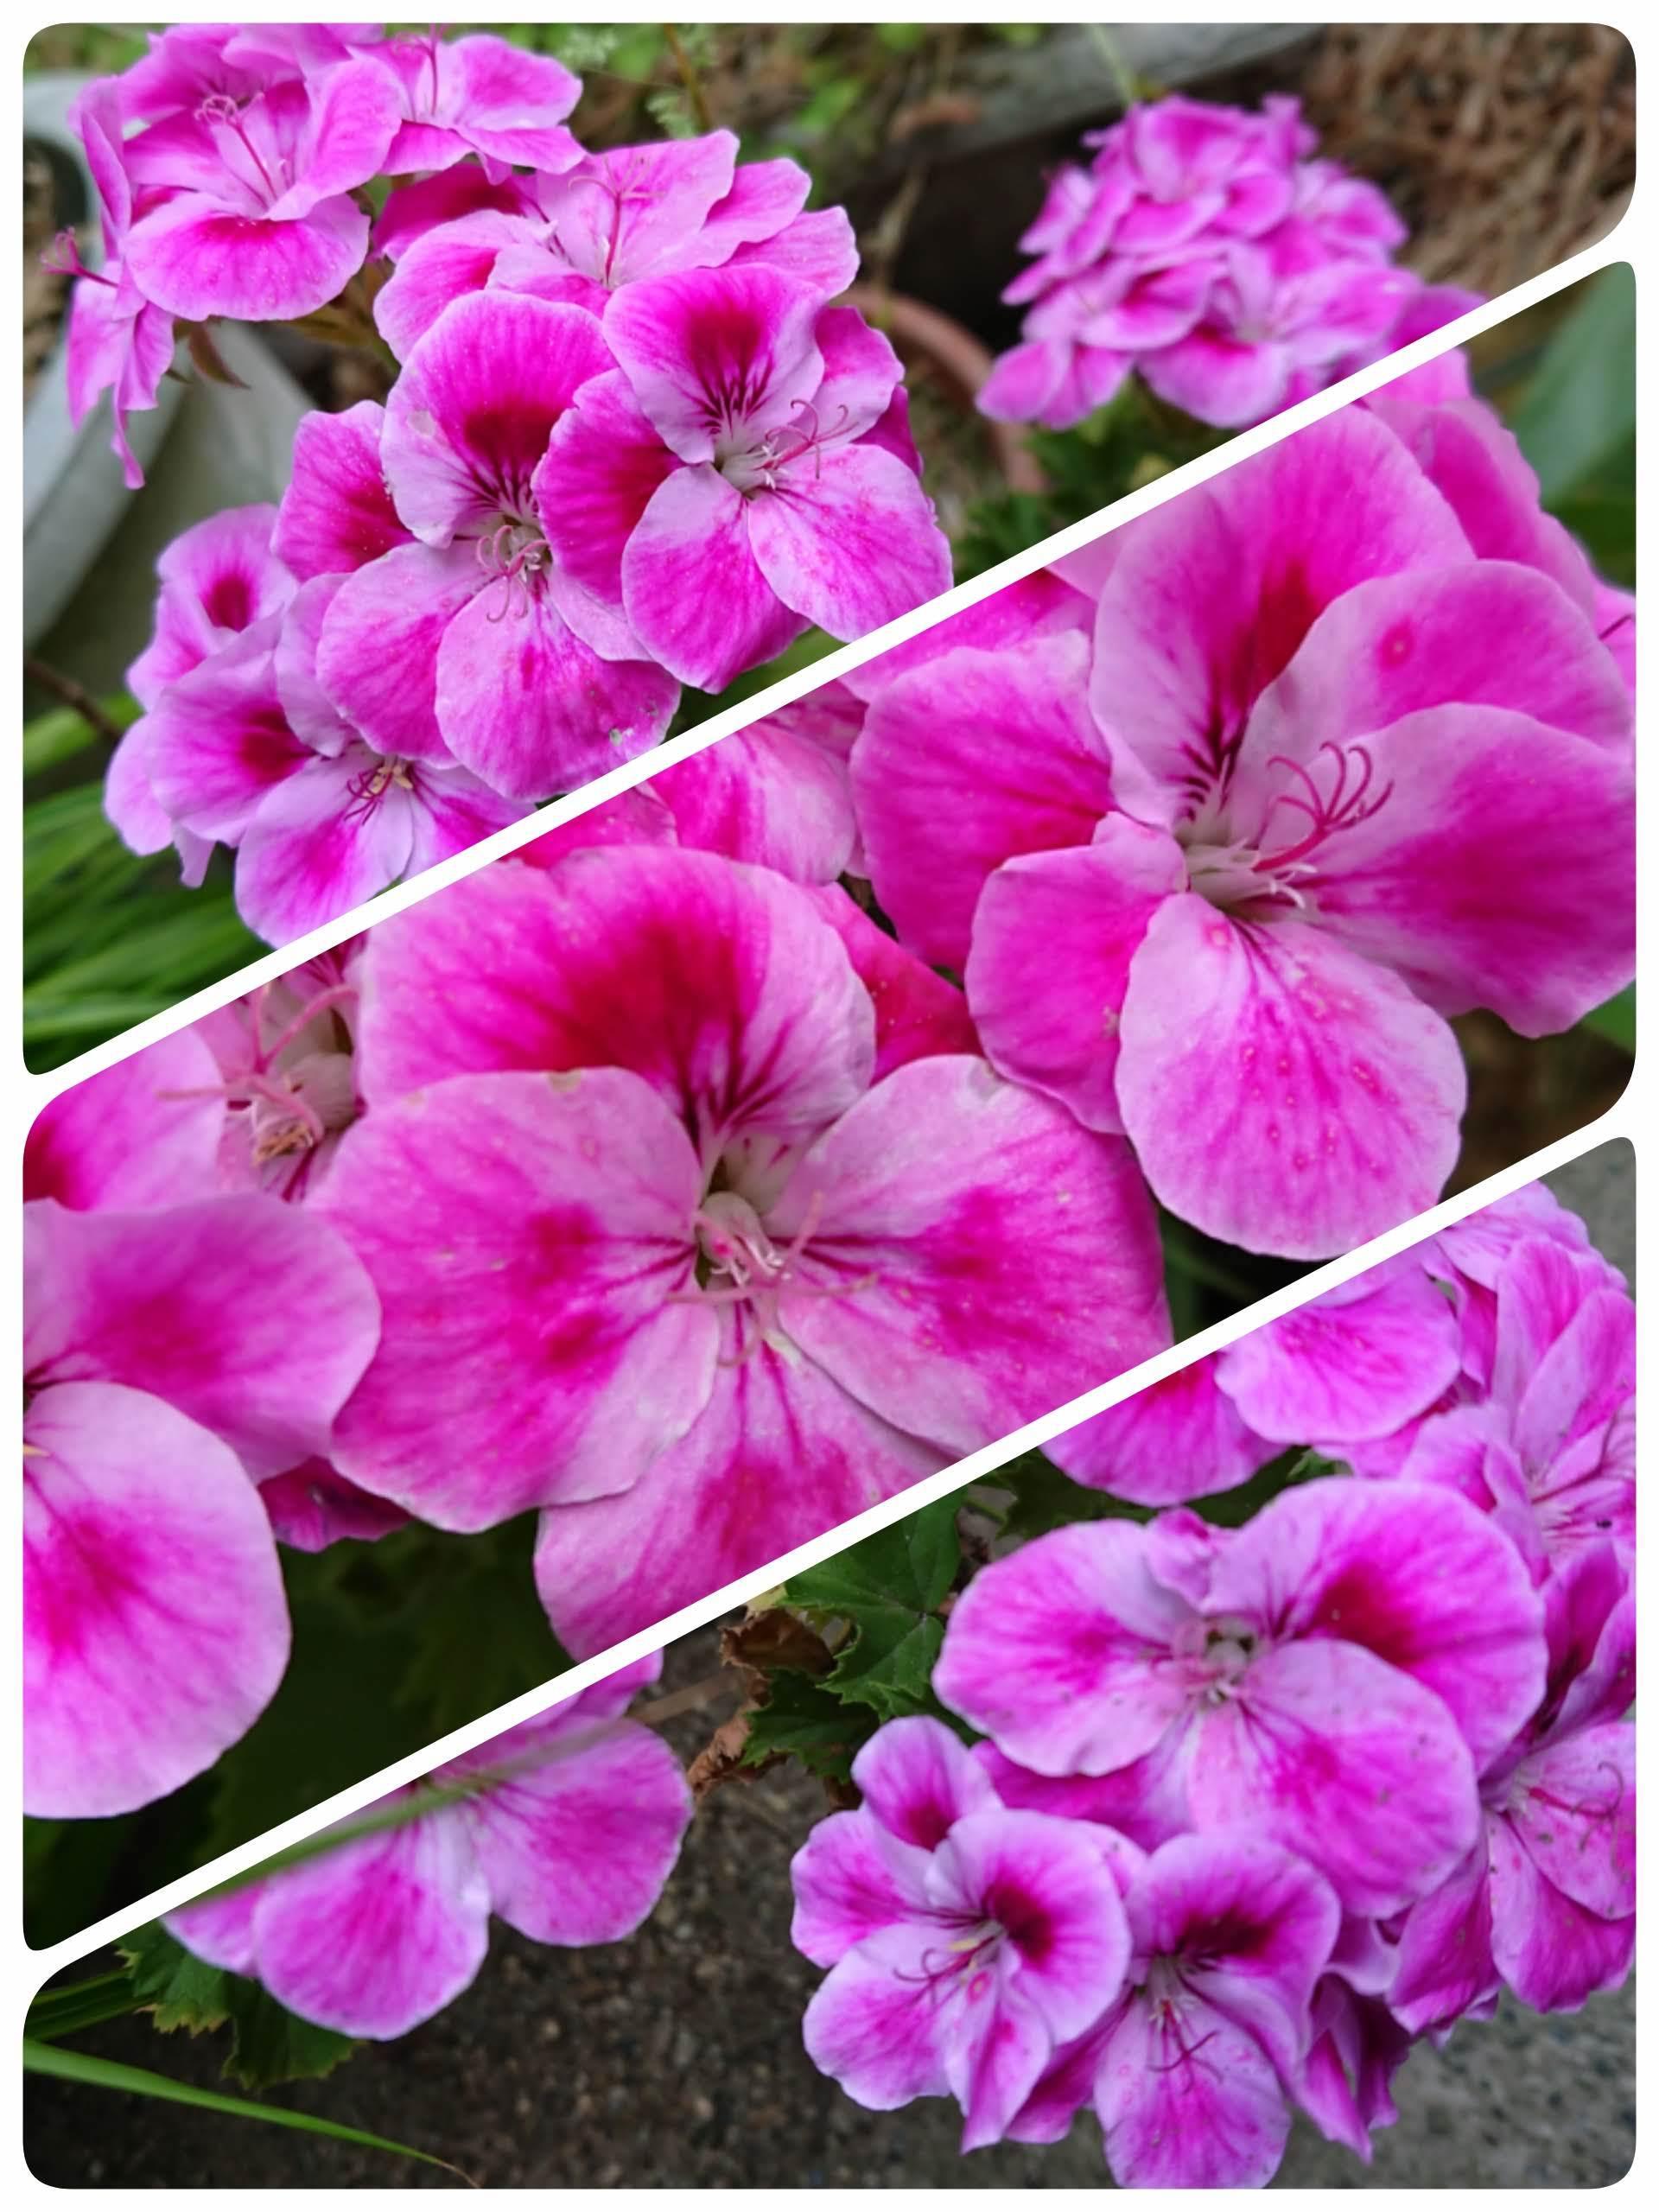 19-05-23-22-19-40-210_deco.jpg